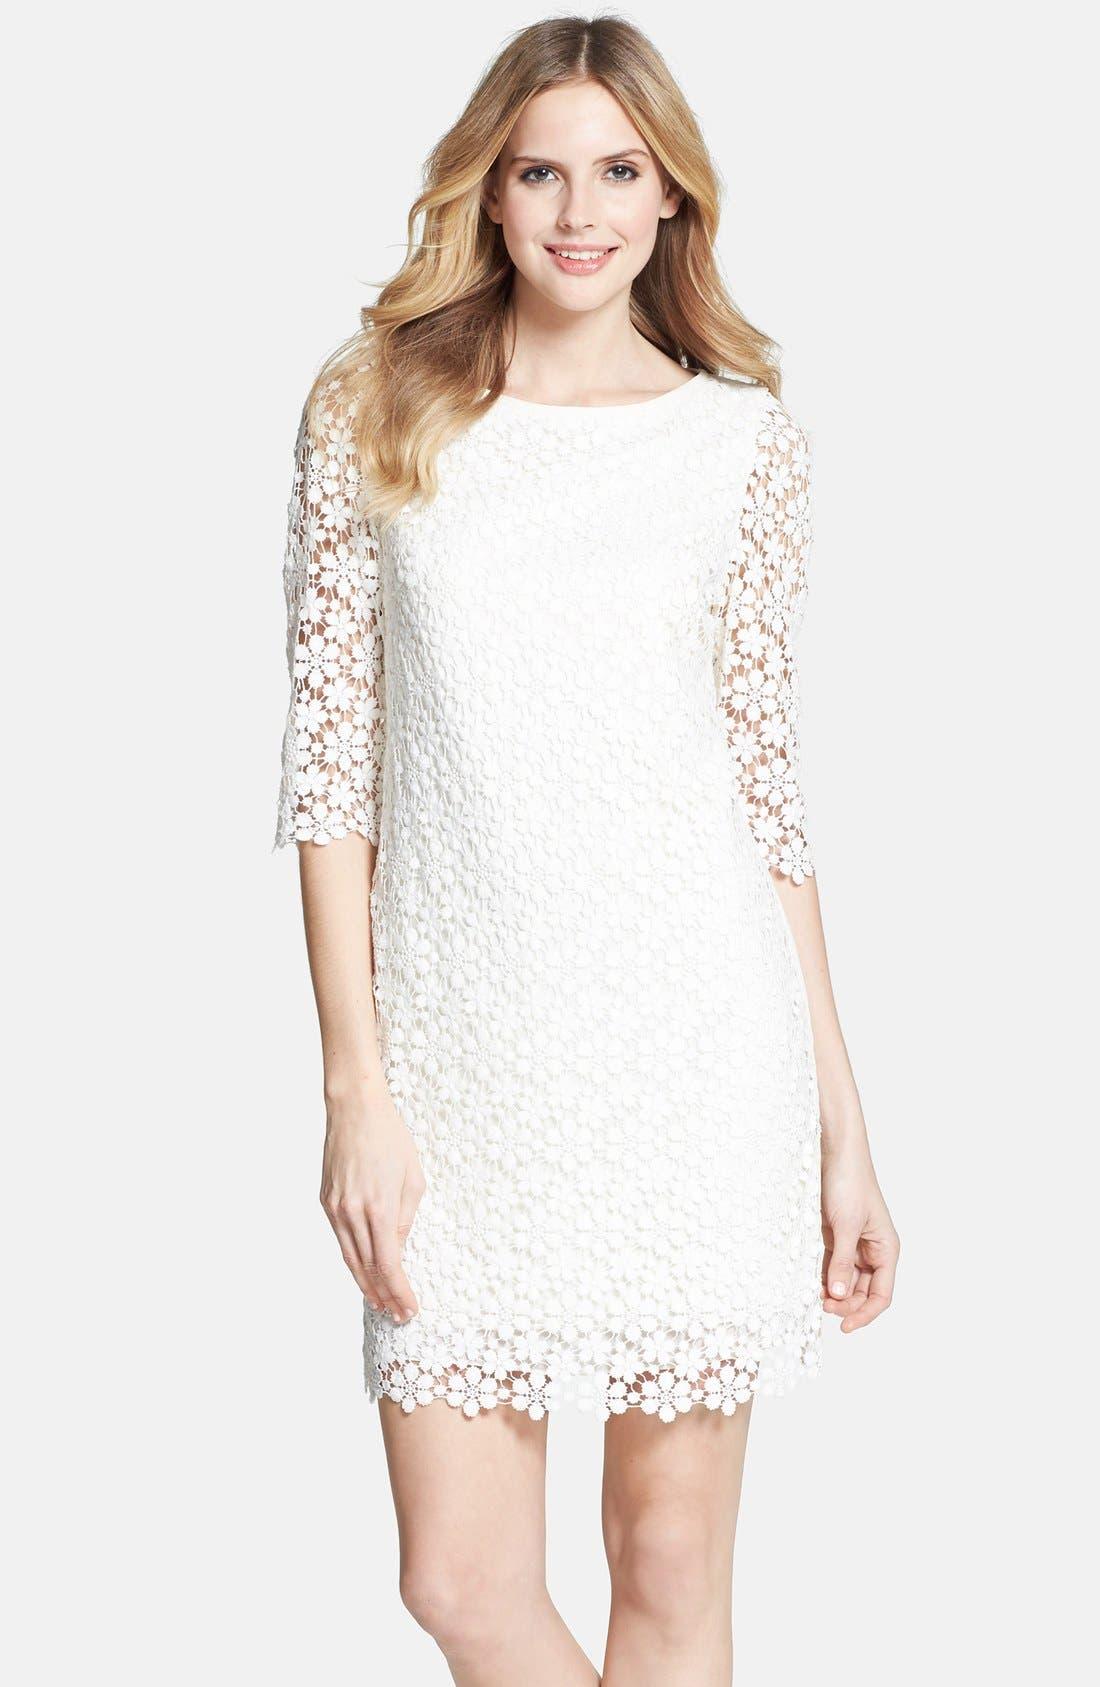 'Tibi' Daisy Guipure Lace Shift Dress,                         Main,                         color, 150